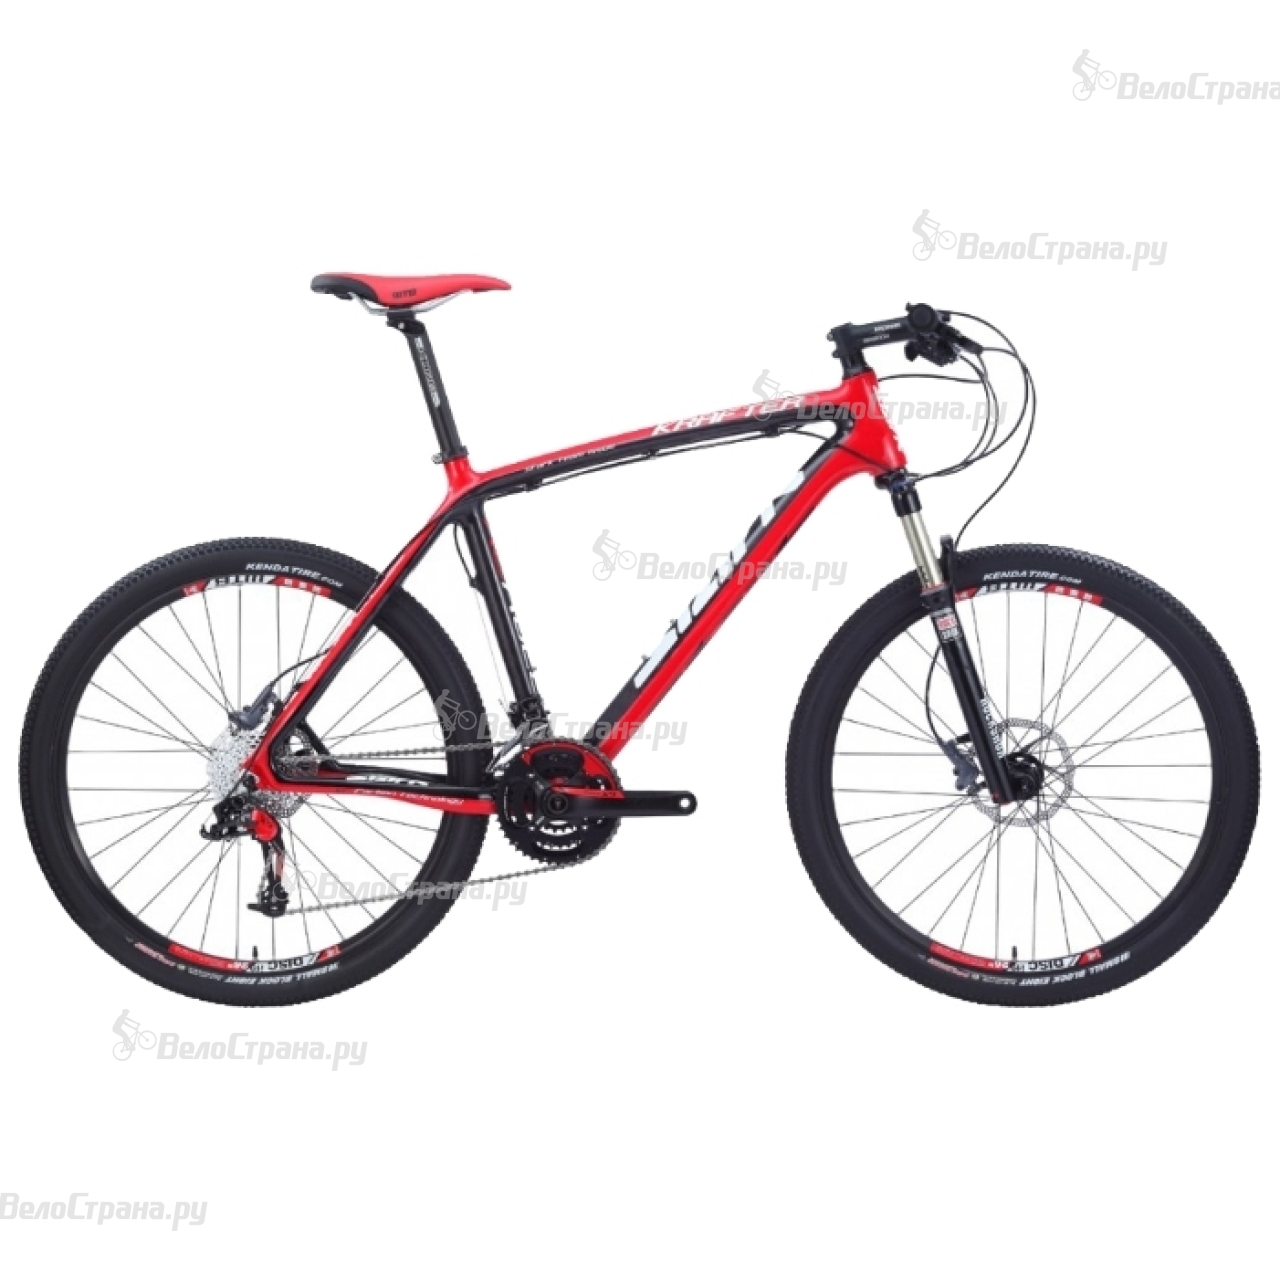 Велосипед Stark Krafter Carbon (2014)